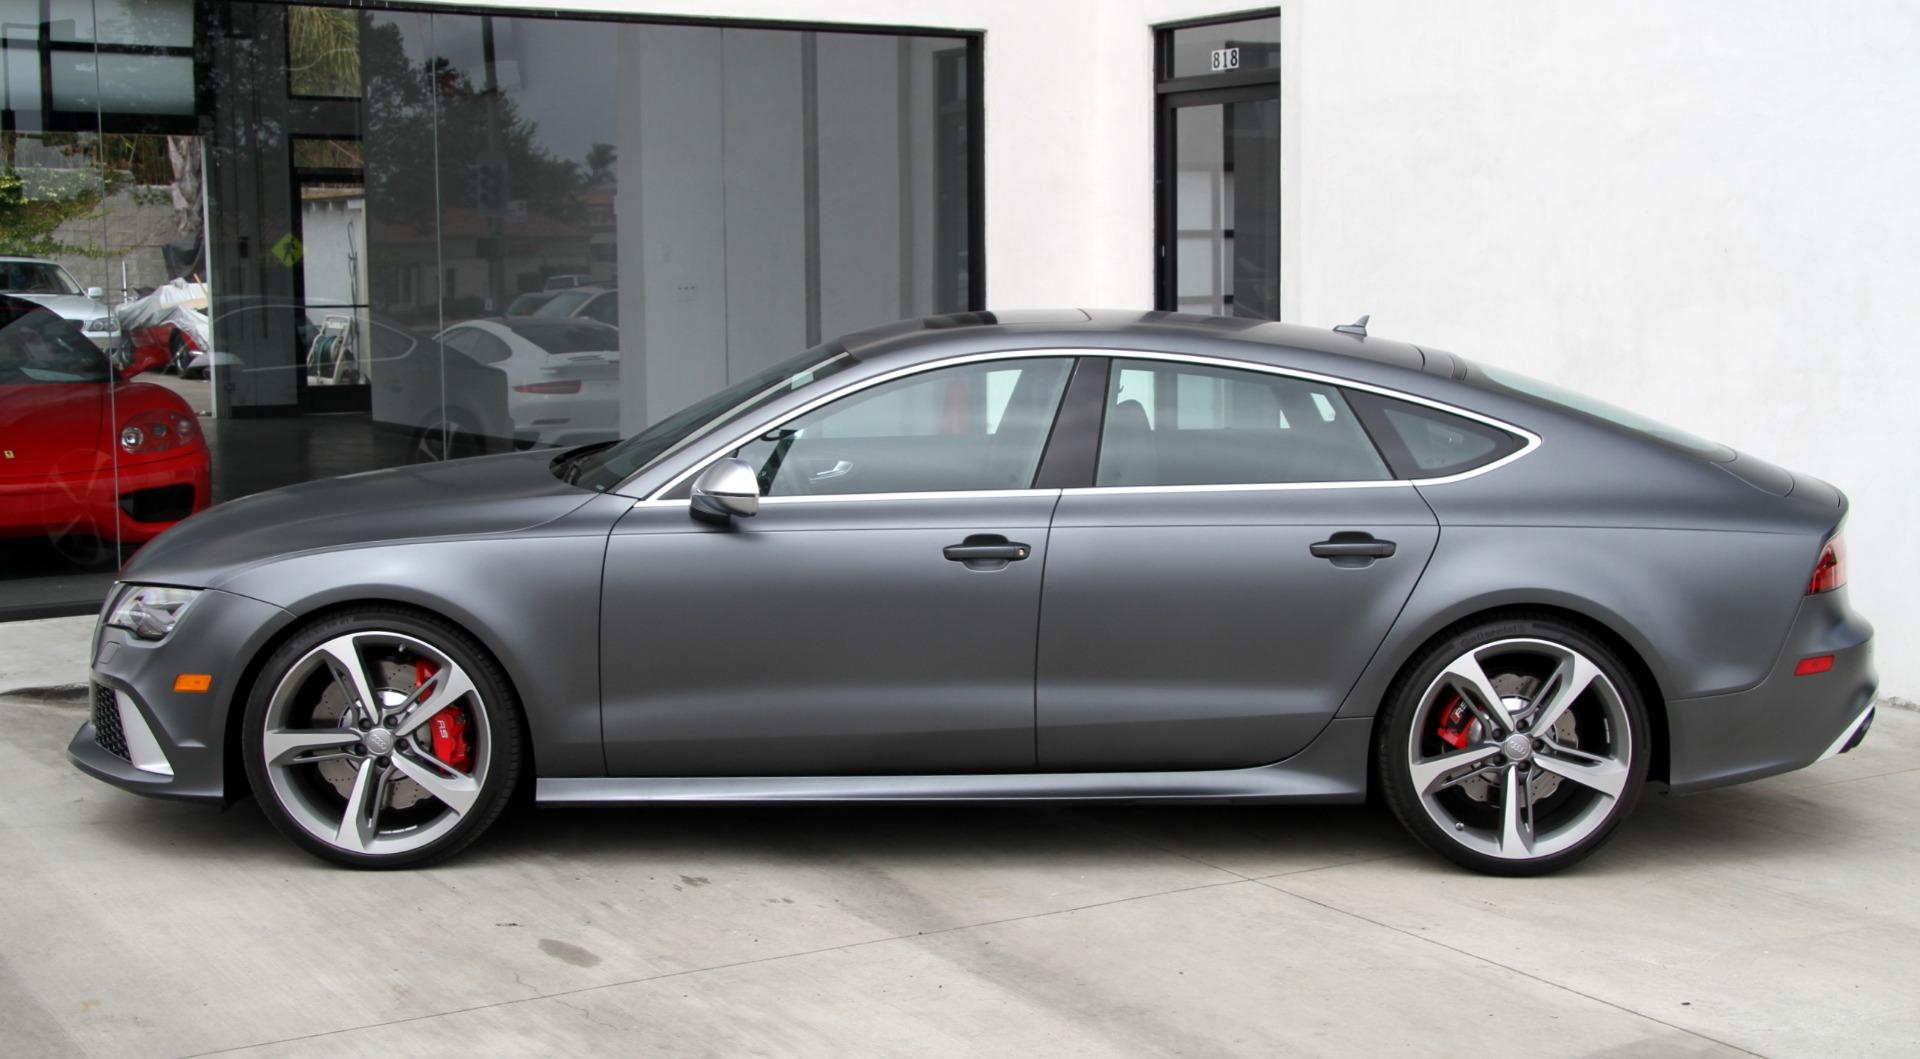 2014 Audi Rs 7 4 0t Prestige Factory Matte Paint Stock 6218 For Sale Near Redondo Beach Ca Ca Audi Dealer